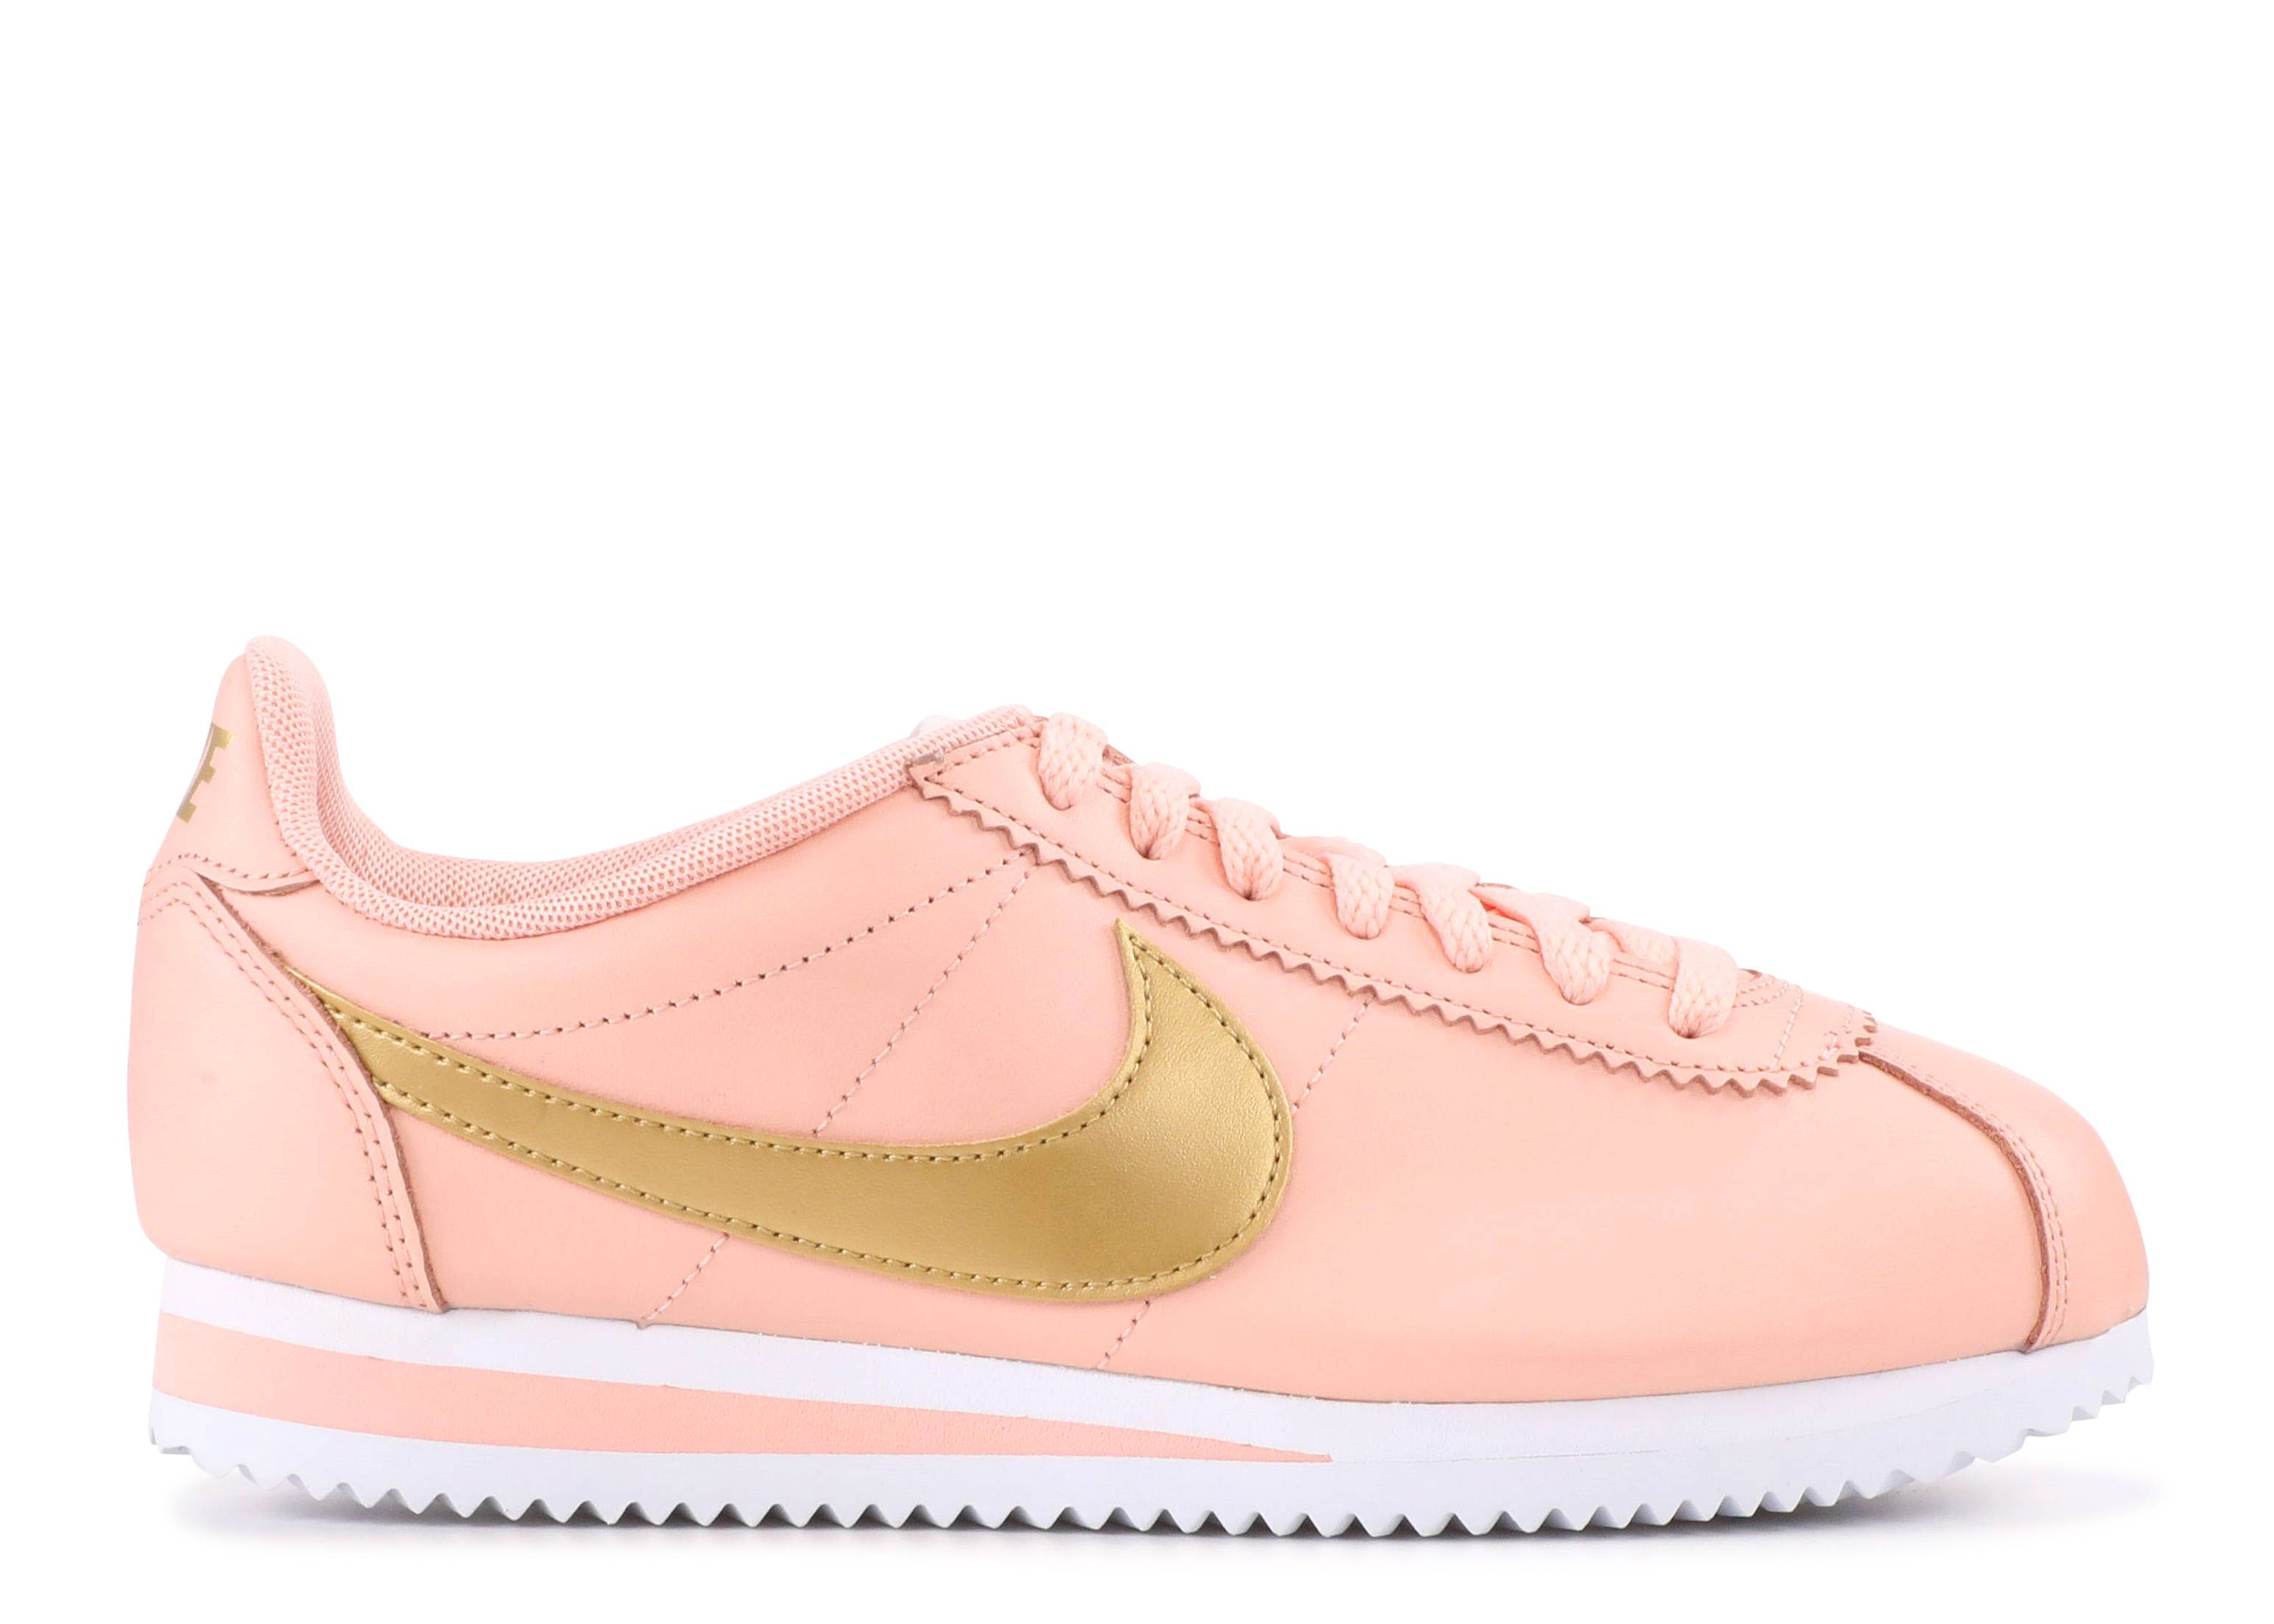 super popular 06399 85ad8 Wmns Classic Cortez Leather - Nike - 807471 800 - artic orange   metallic  gold   Flight Club